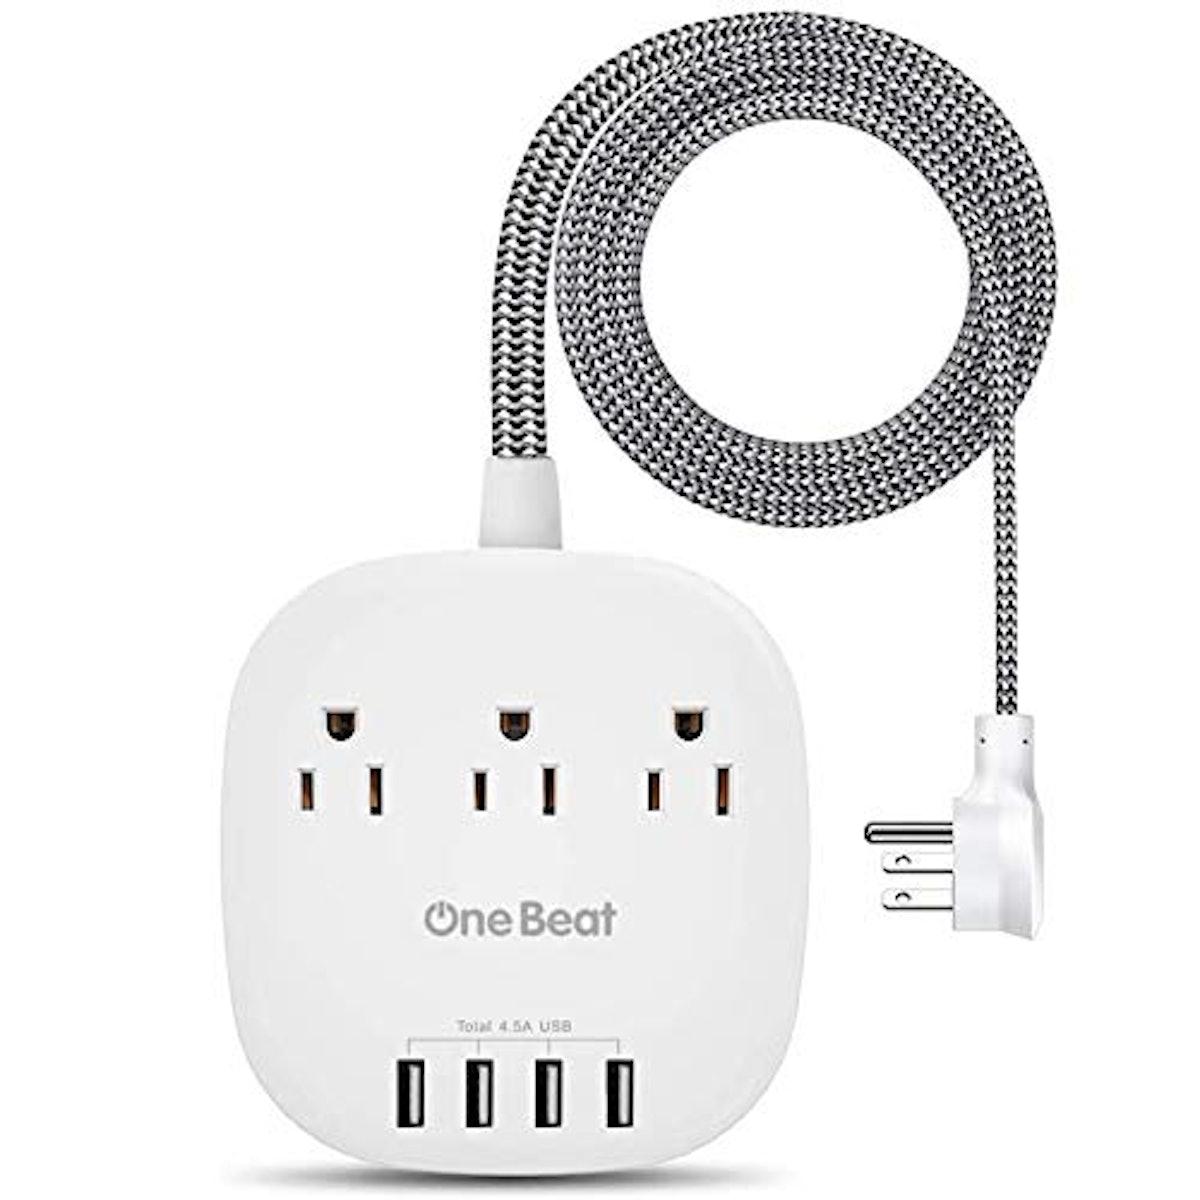 One Beat Power Strip With USB Ports